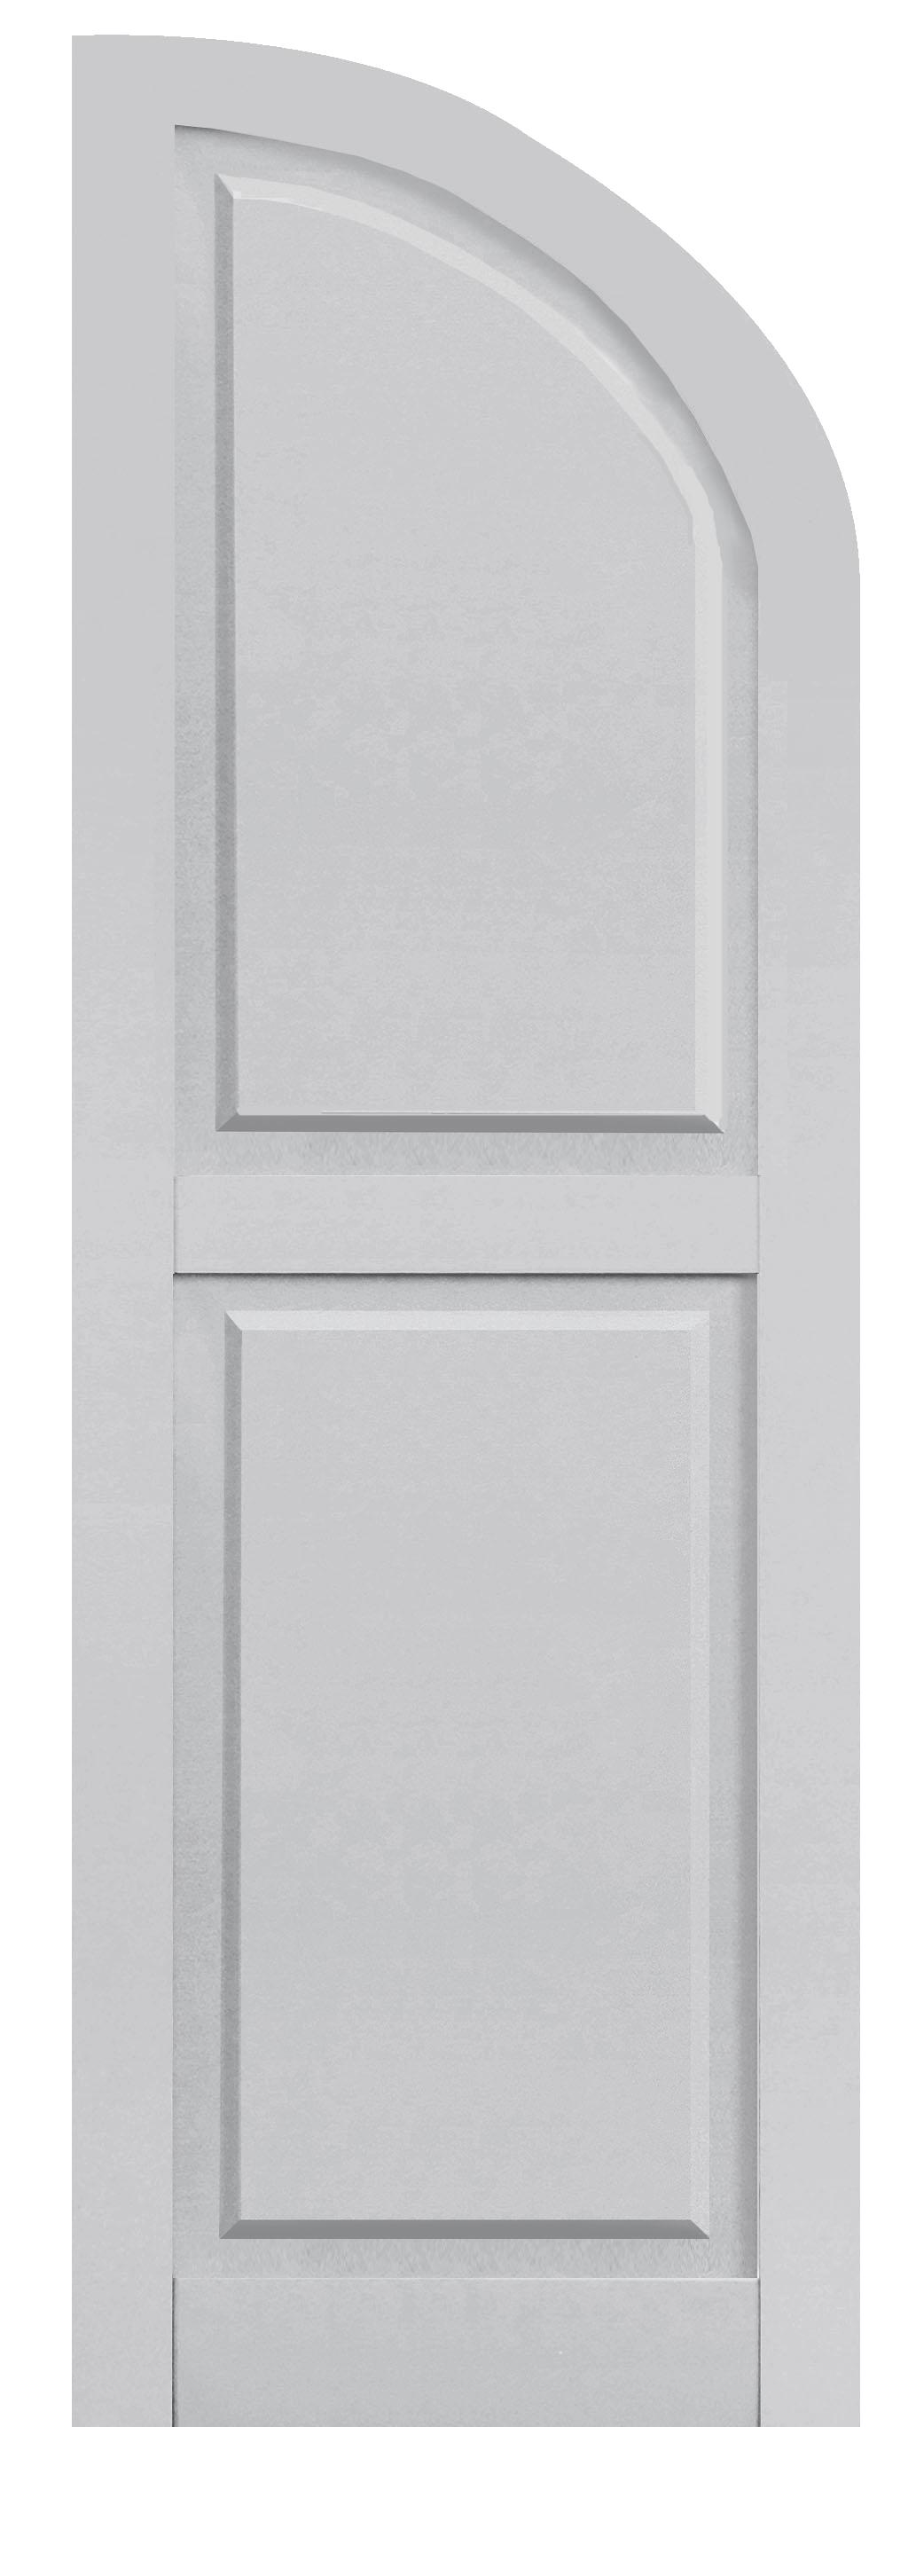 Composite Paneled Quarter Round Arch Top